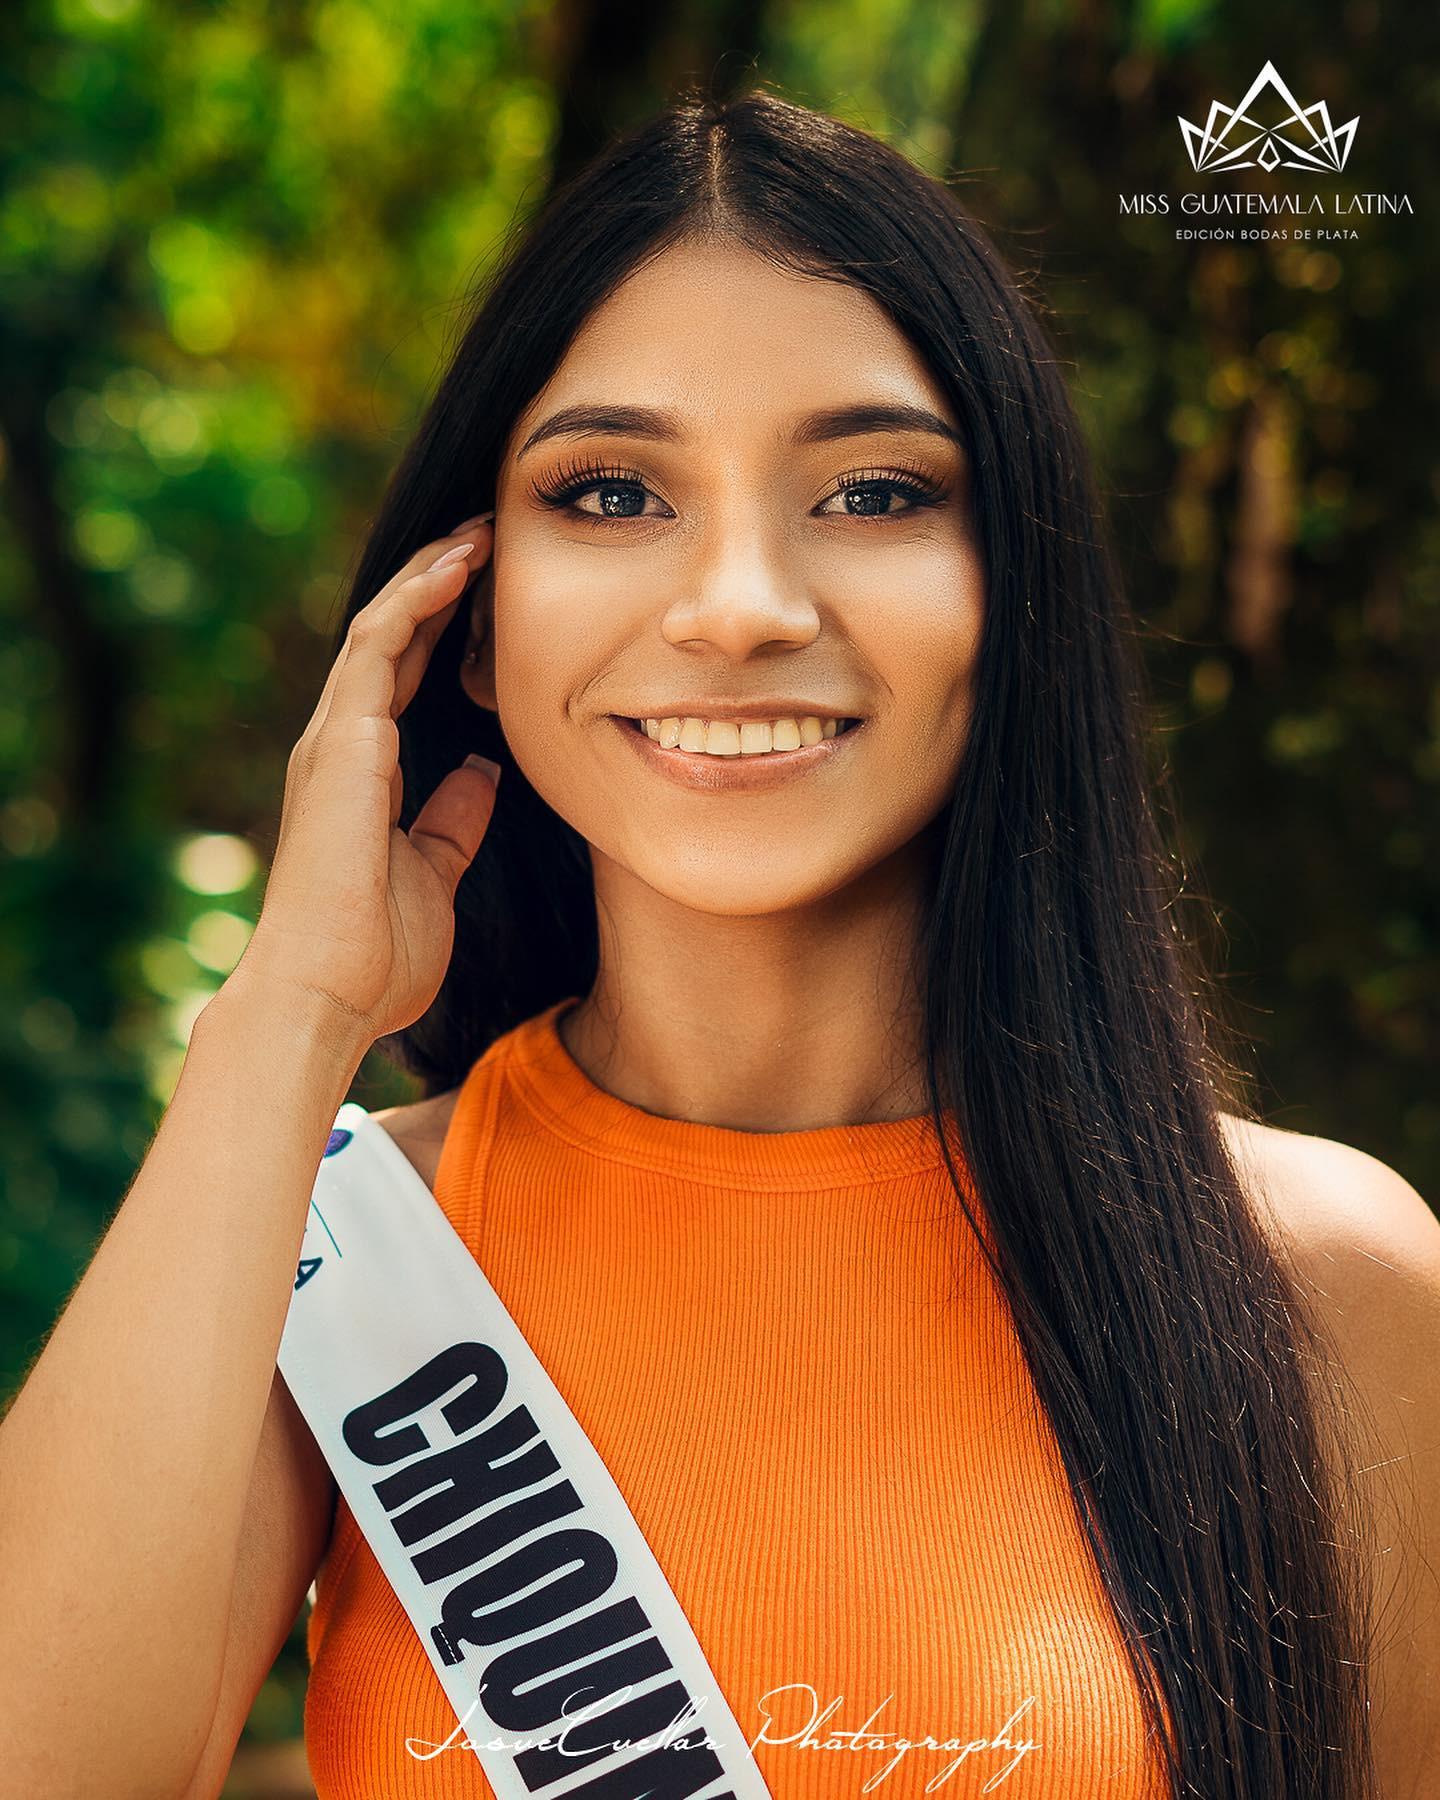 candidatas a miss guatemala latina 2021. final: 30 de abril. - Página 7 BFjWVR